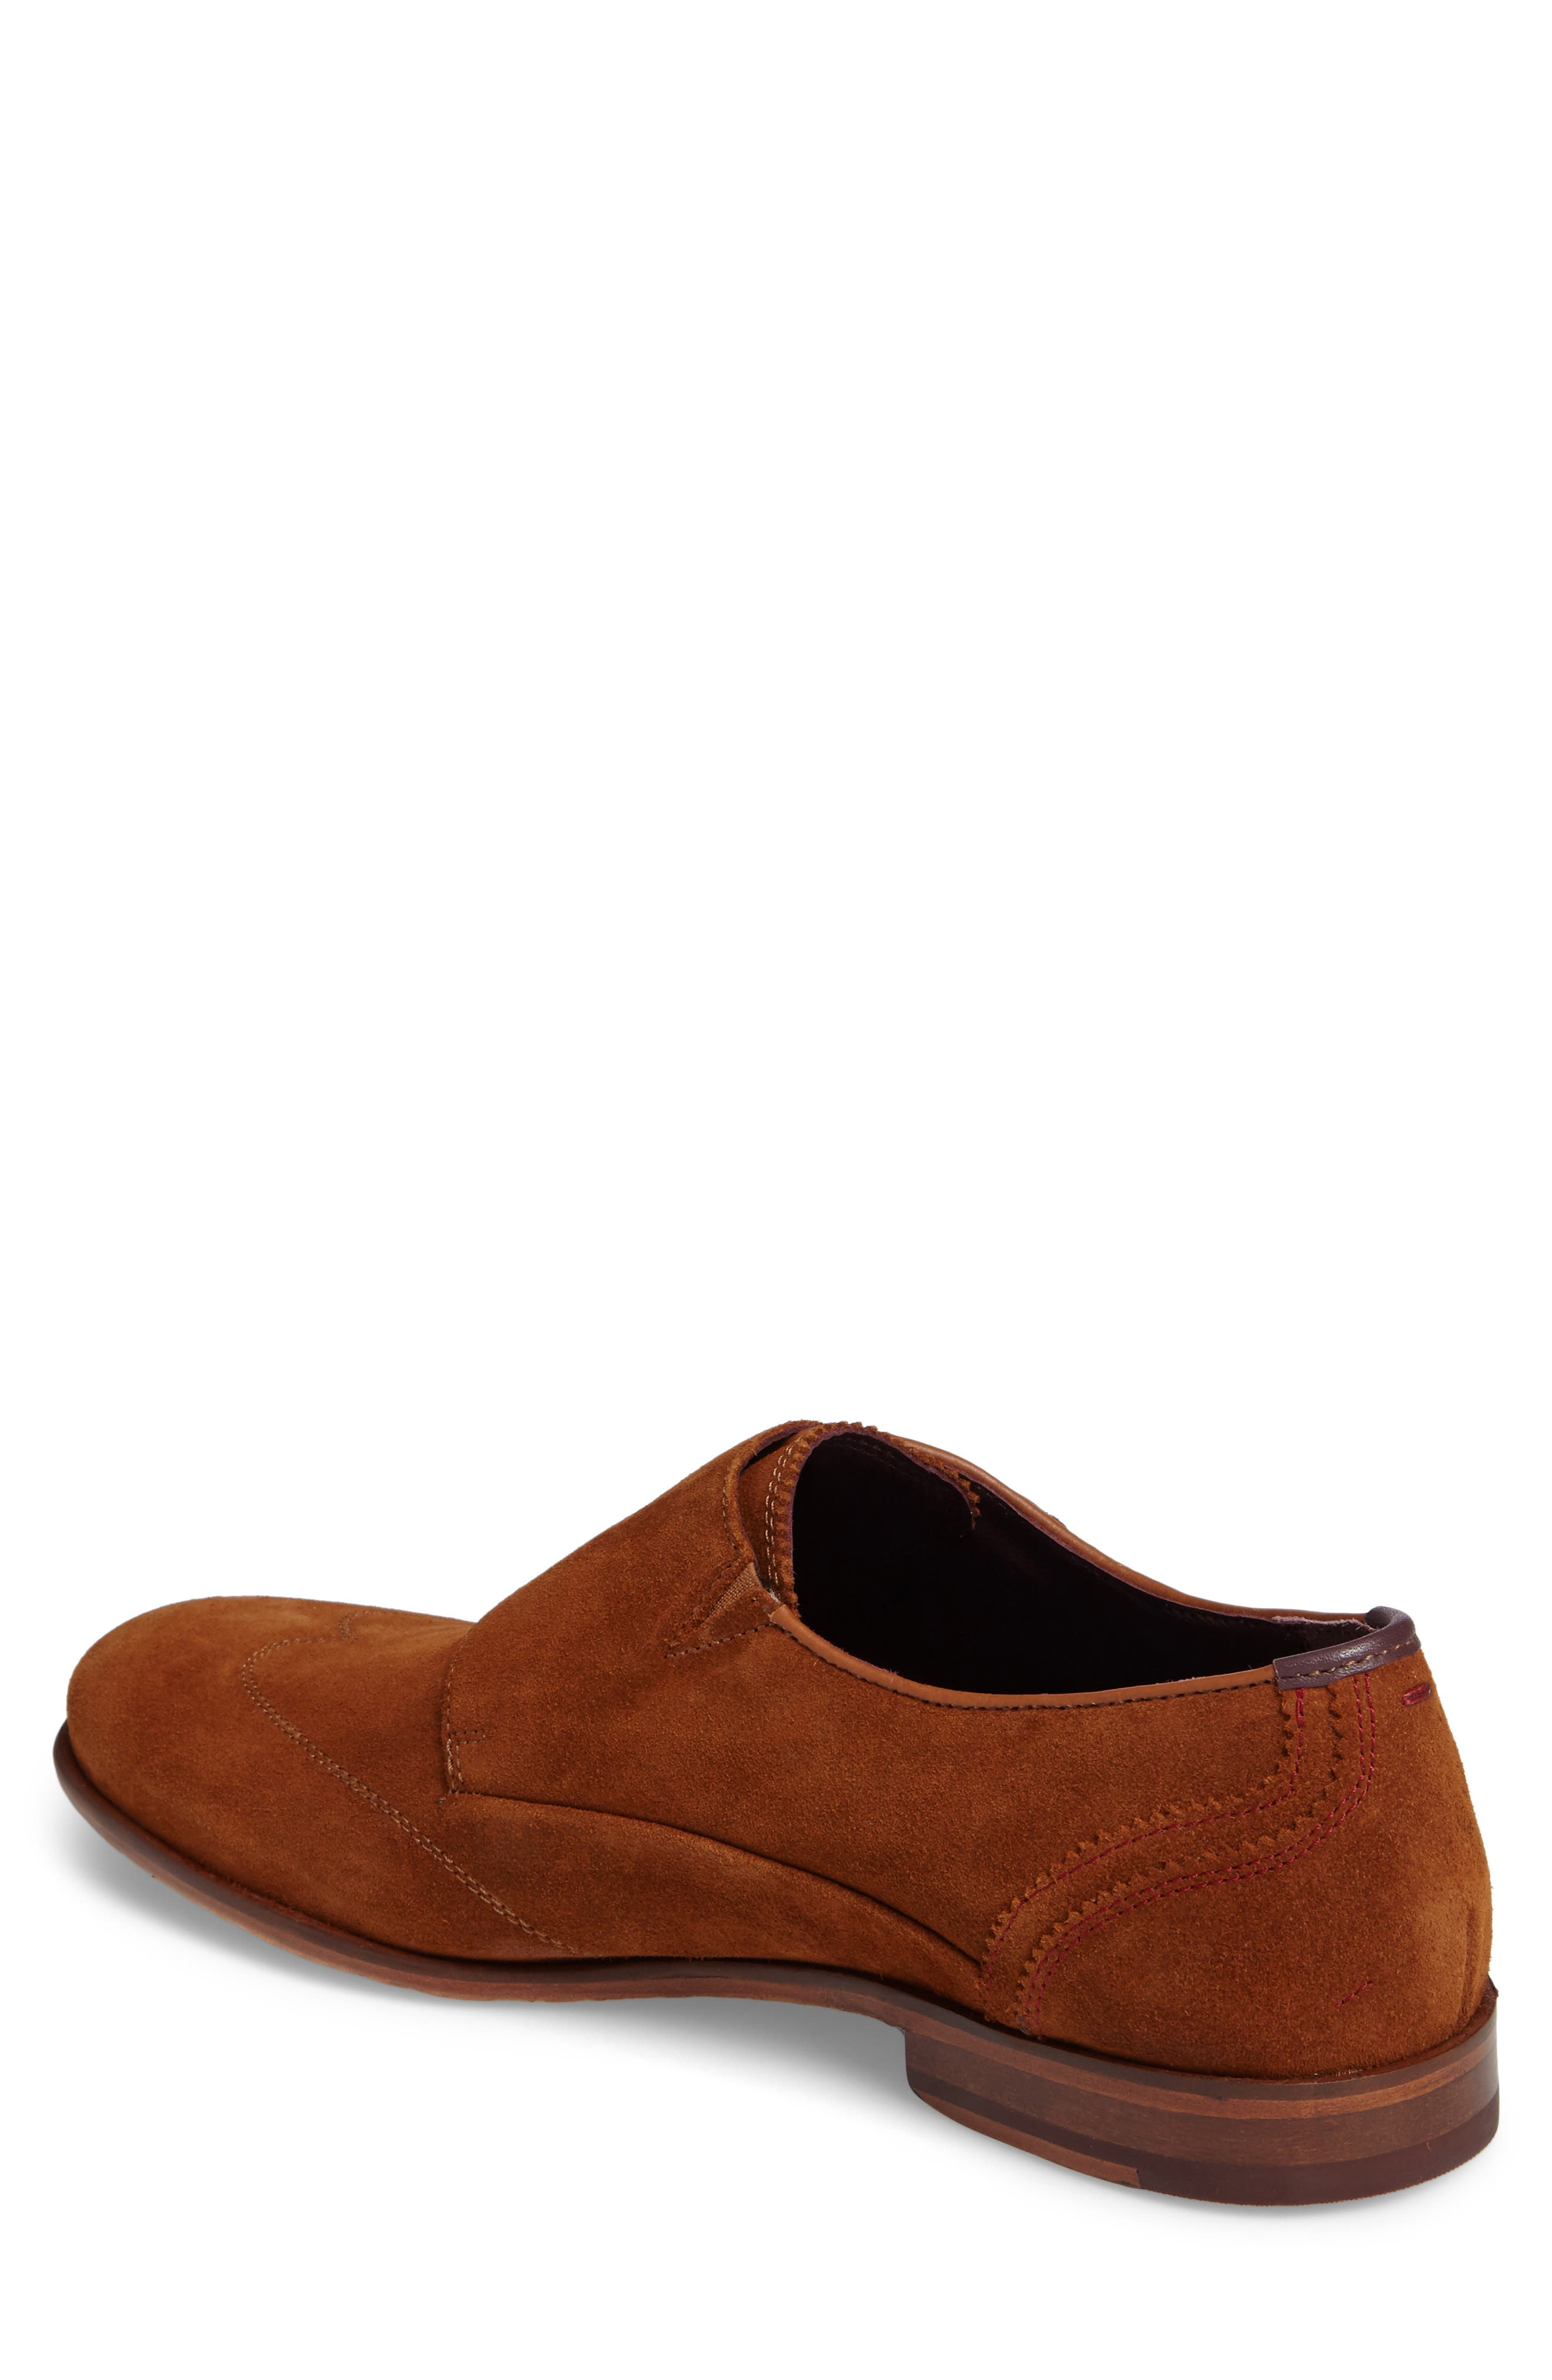 Rovere Wingtip Monk Shoe,                             Alternate thumbnail 2, color,                             TAN SUEDE